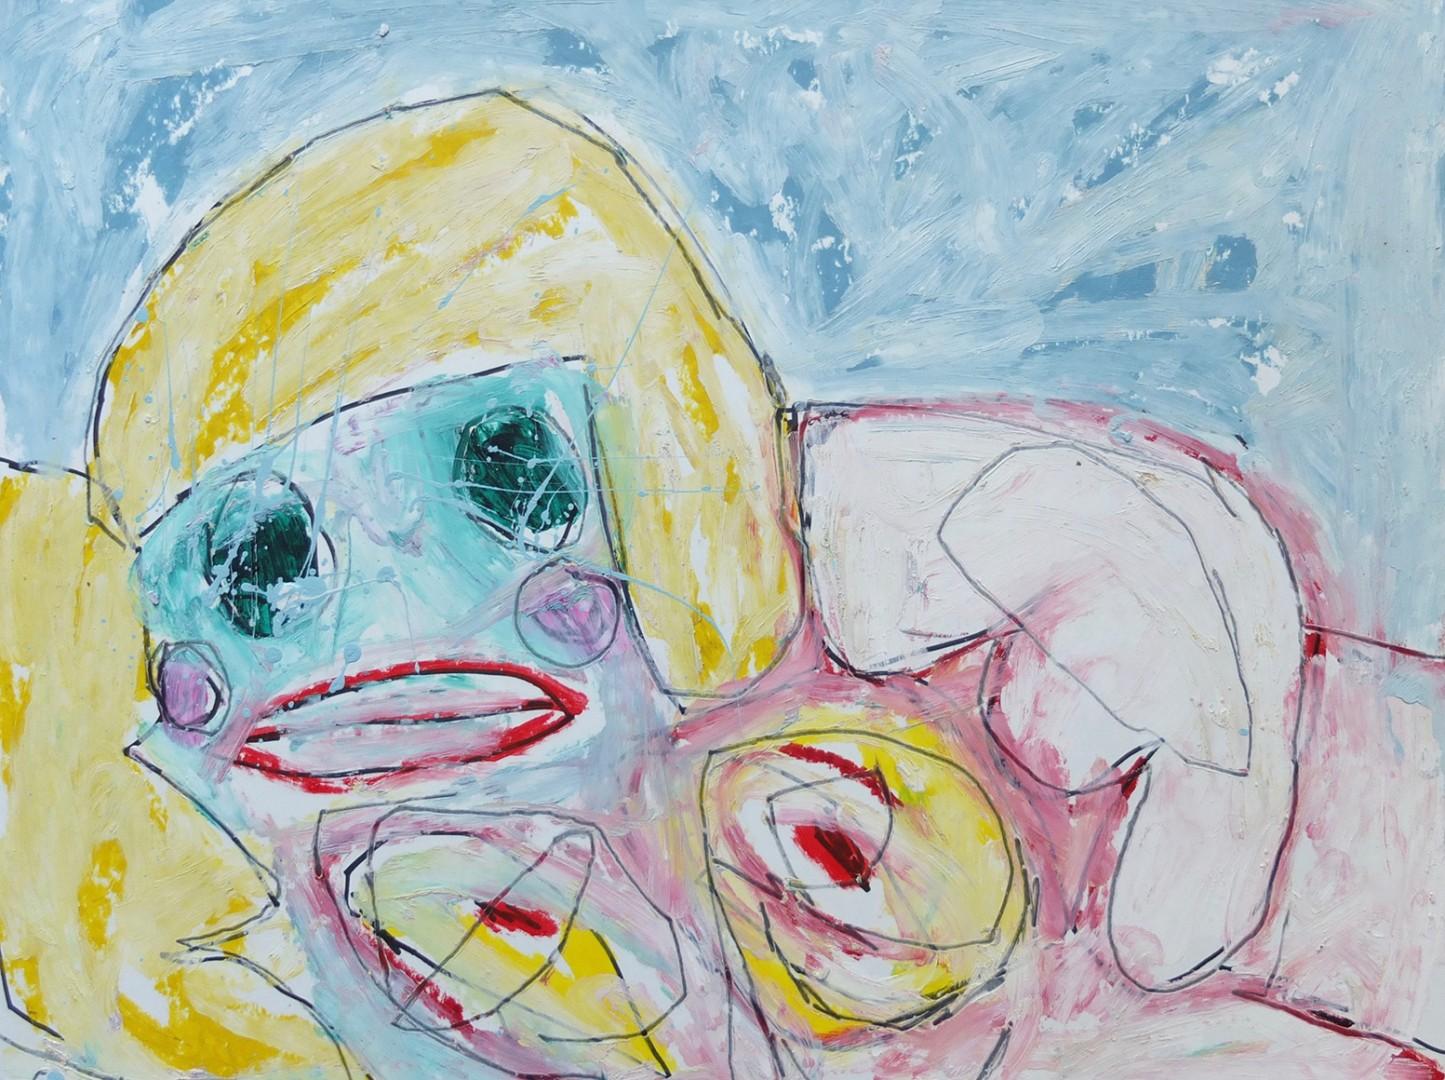 Madelyn Jordon Fine Art ADAM HANDLER: BETWEEN NIGHTMARES AND FAIRY TALES Reclining Nude Study